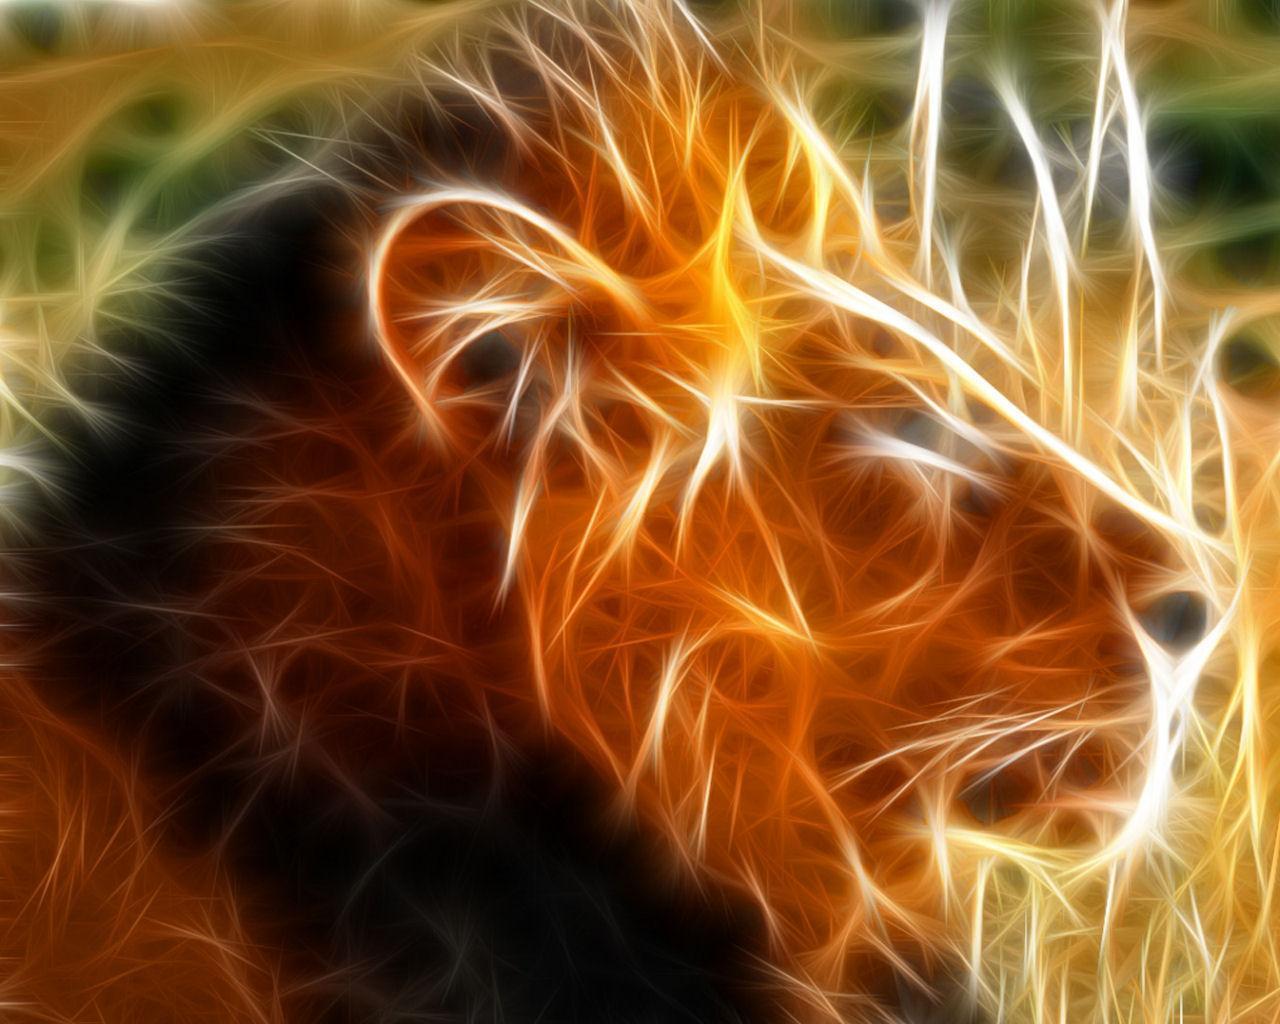 http://3.bp.blogspot.com/_4tBF-y3yTc8/S8GMDmptO6I/AAAAAAAAAe0/r6dE2ZdLZV8/s1600/lion-3d-3d-pictures.jpg